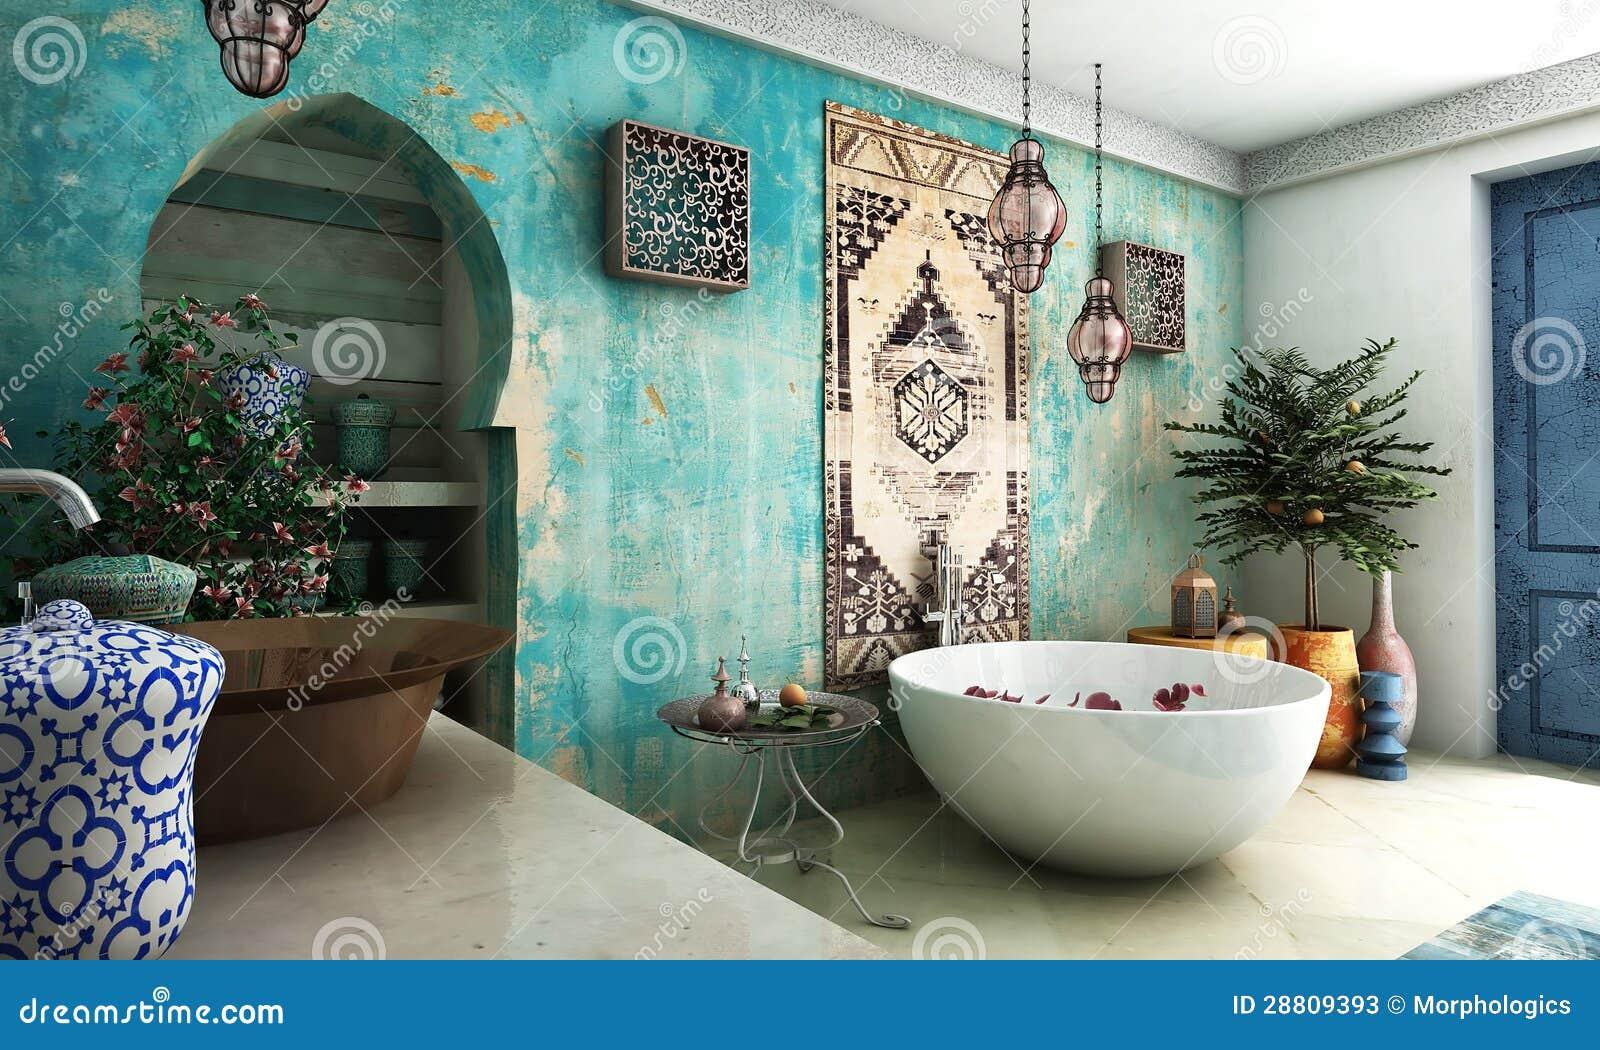 Marokanska Lazienka Obraz Stock Obraz Zlozonej Z Ceramiczny 28809393